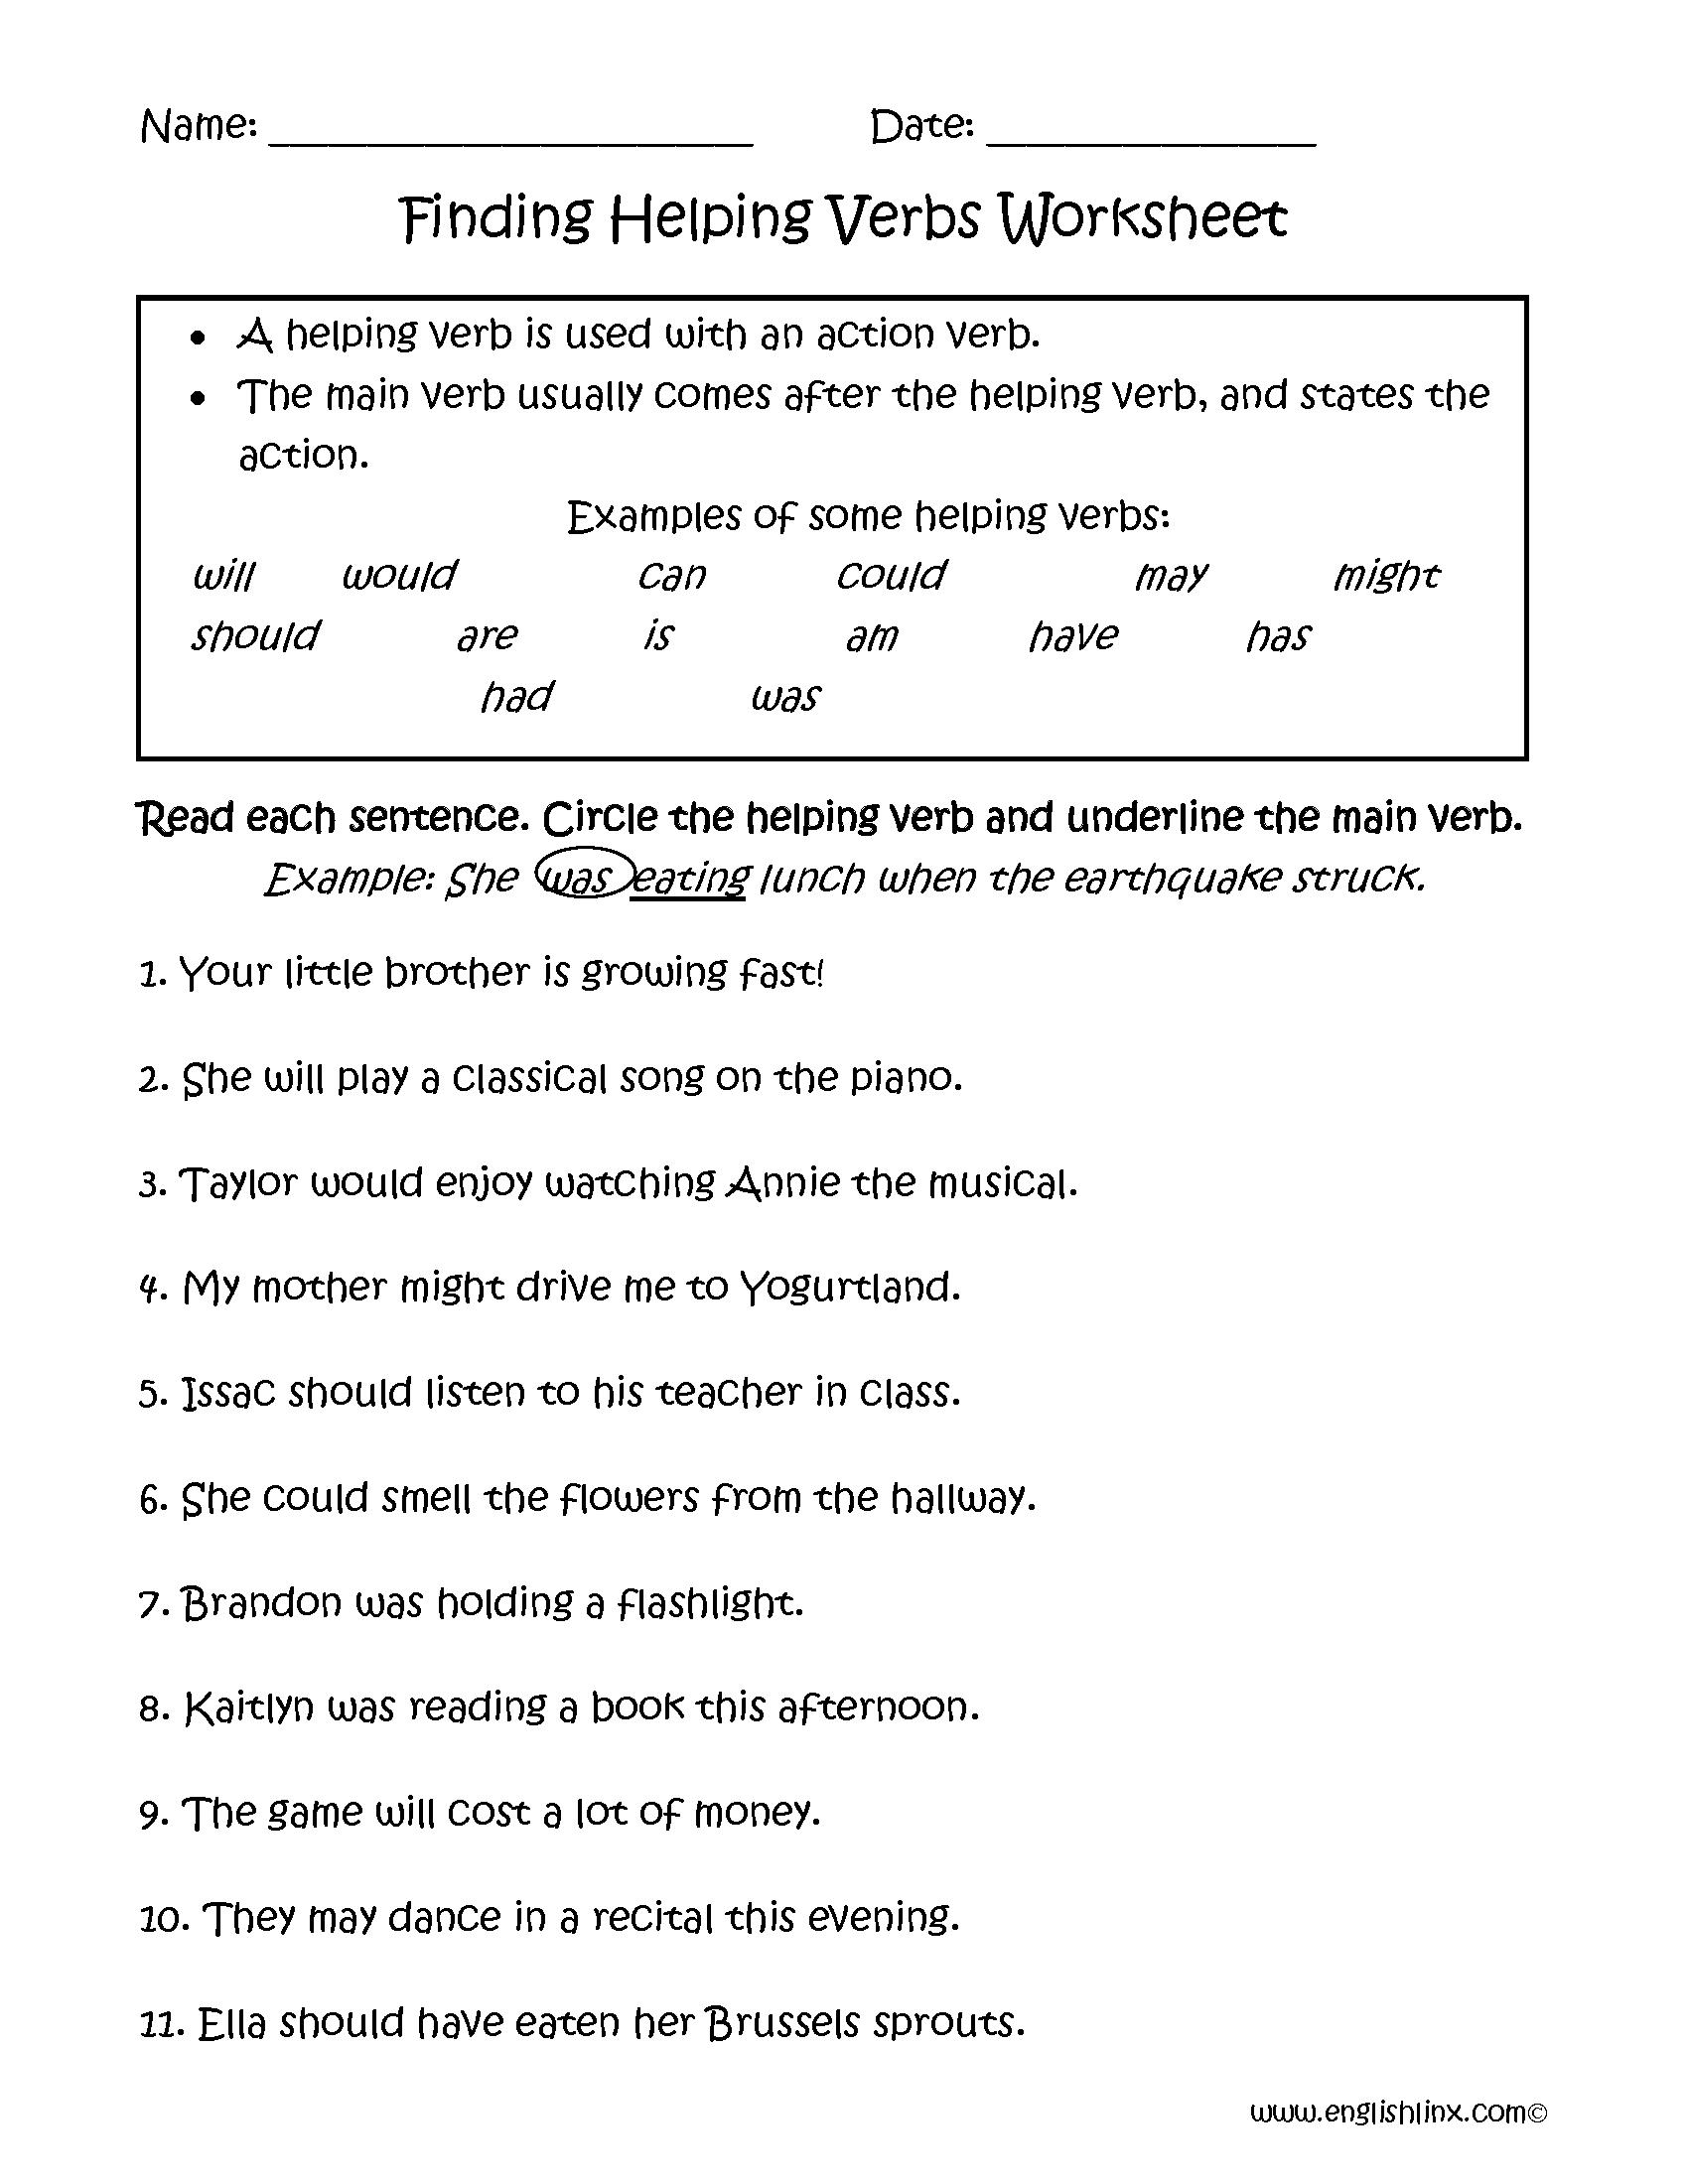 worksheet Linking Verb Worksheets finding helping verbs worksheets pinterest verb worksheetslinking